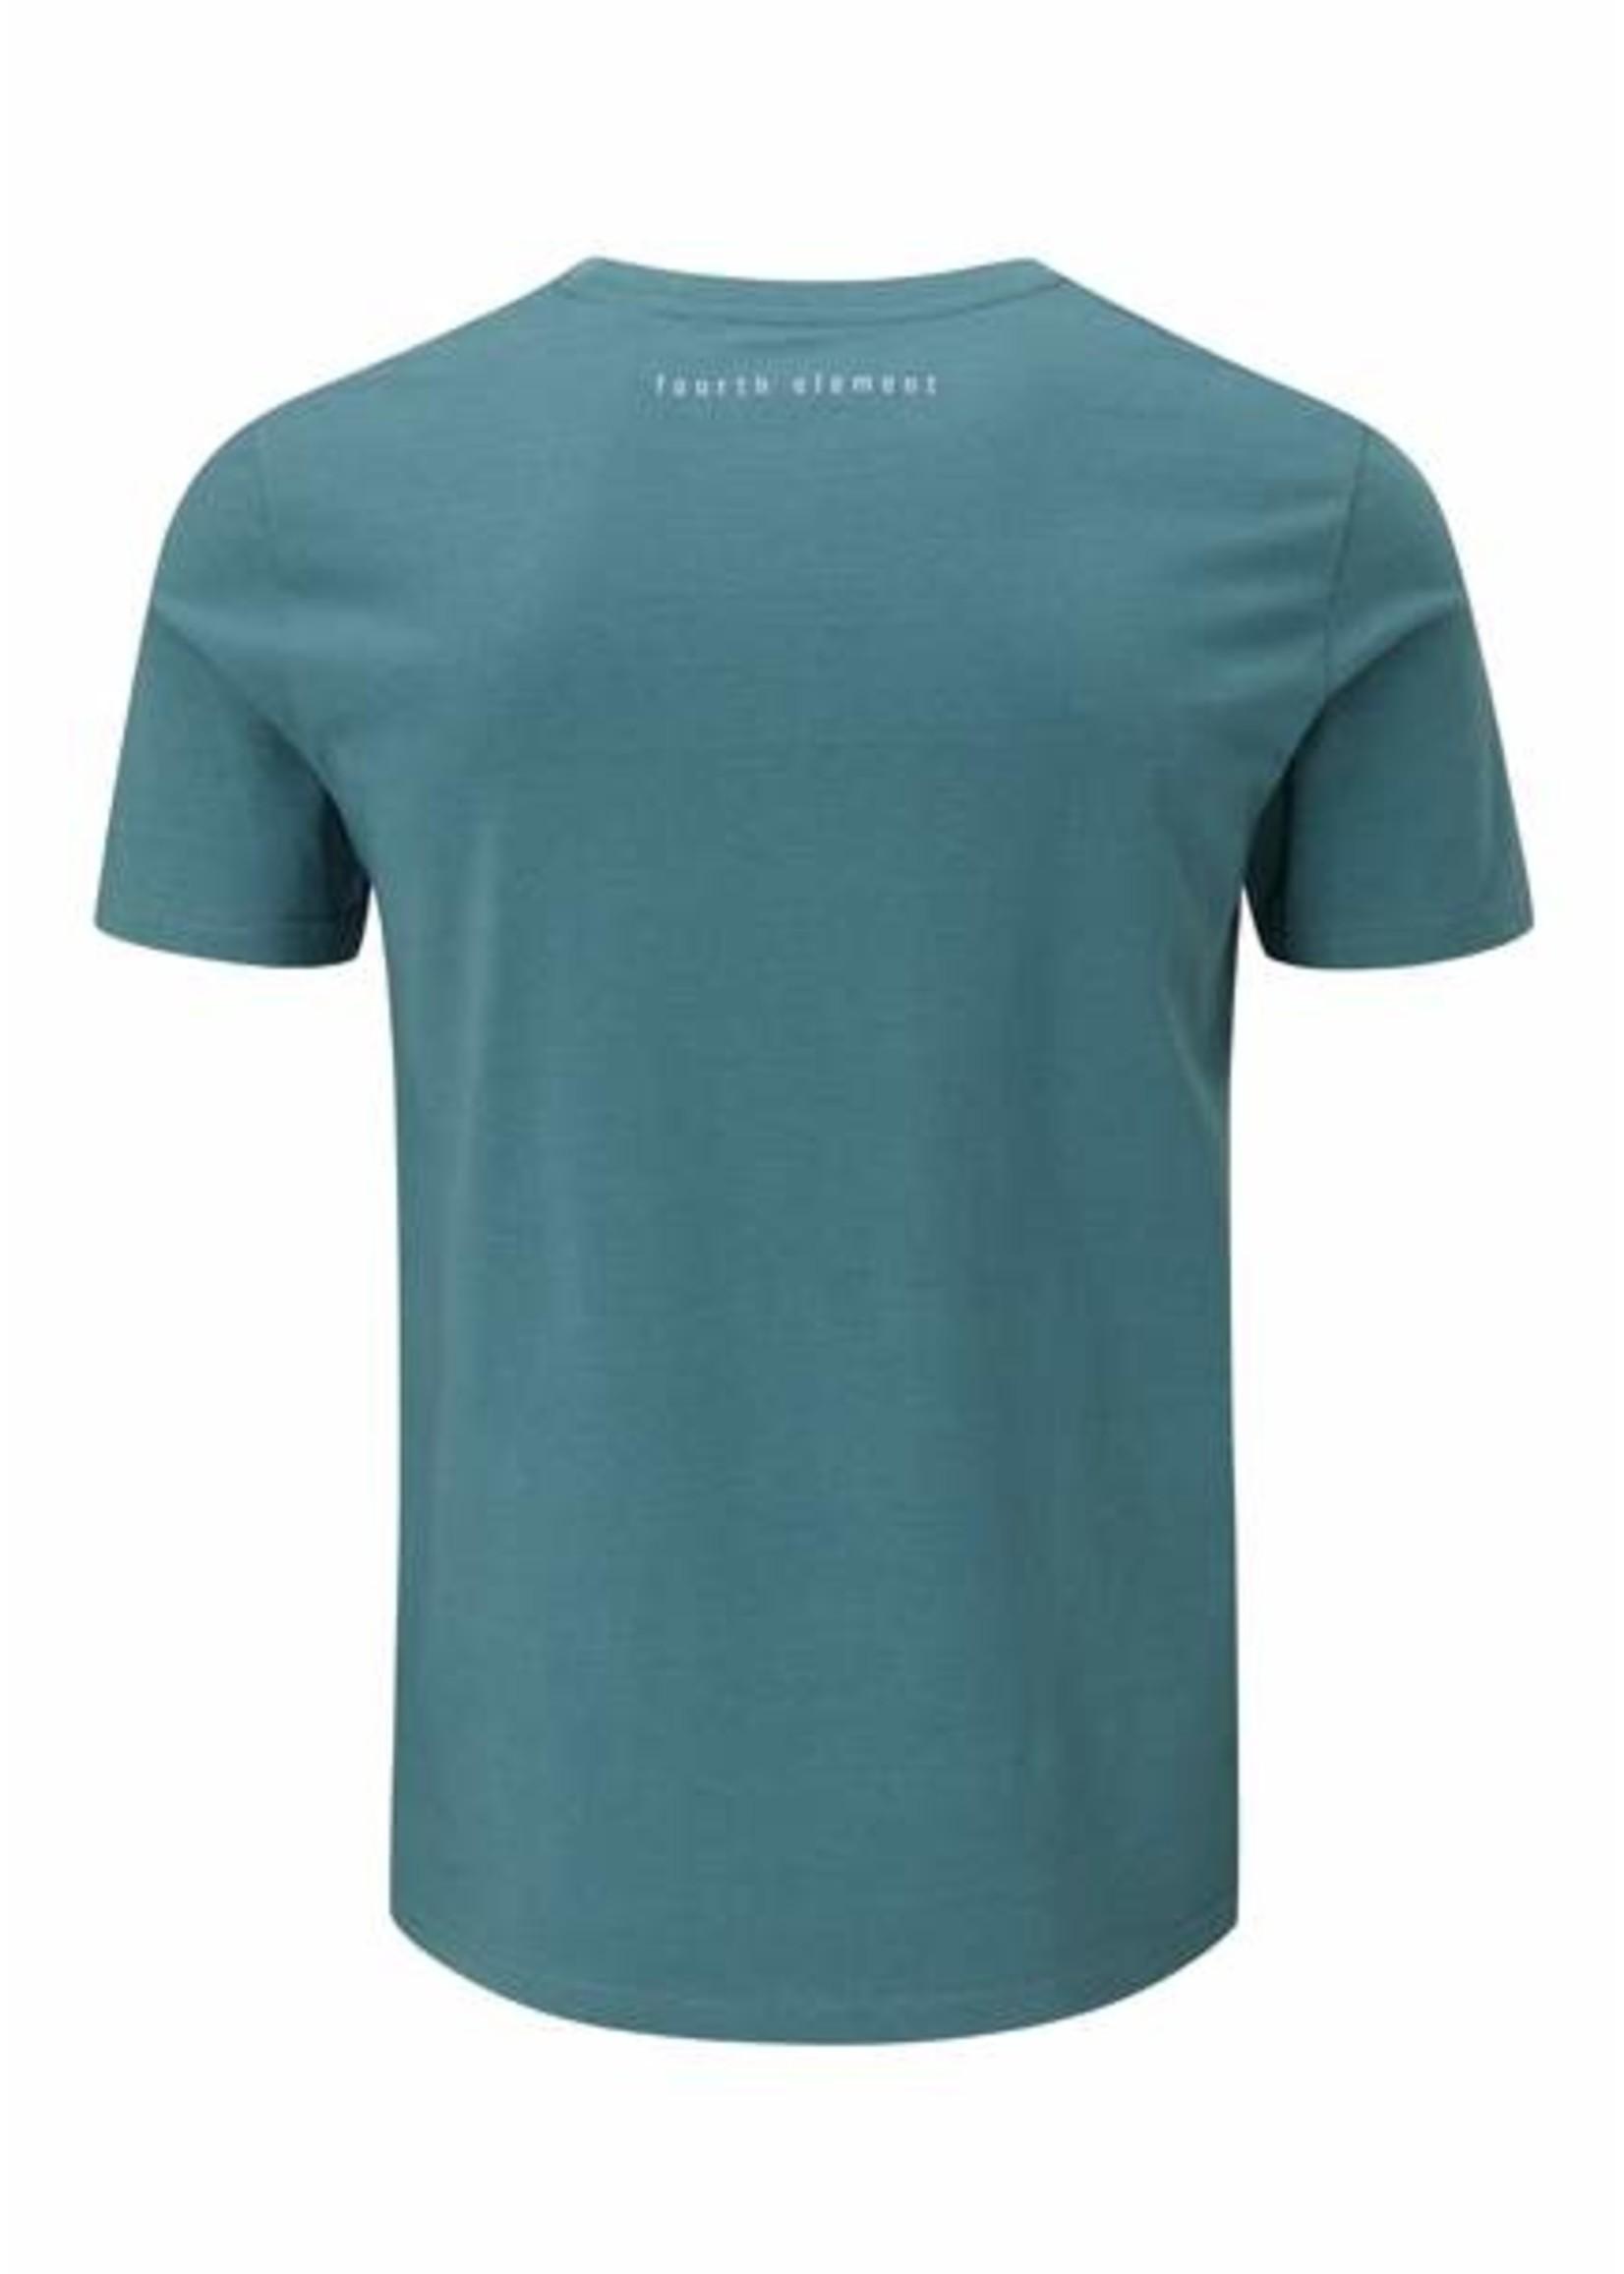 Fourth Element Fourth Element Humpback Petrol T-Shirt - man